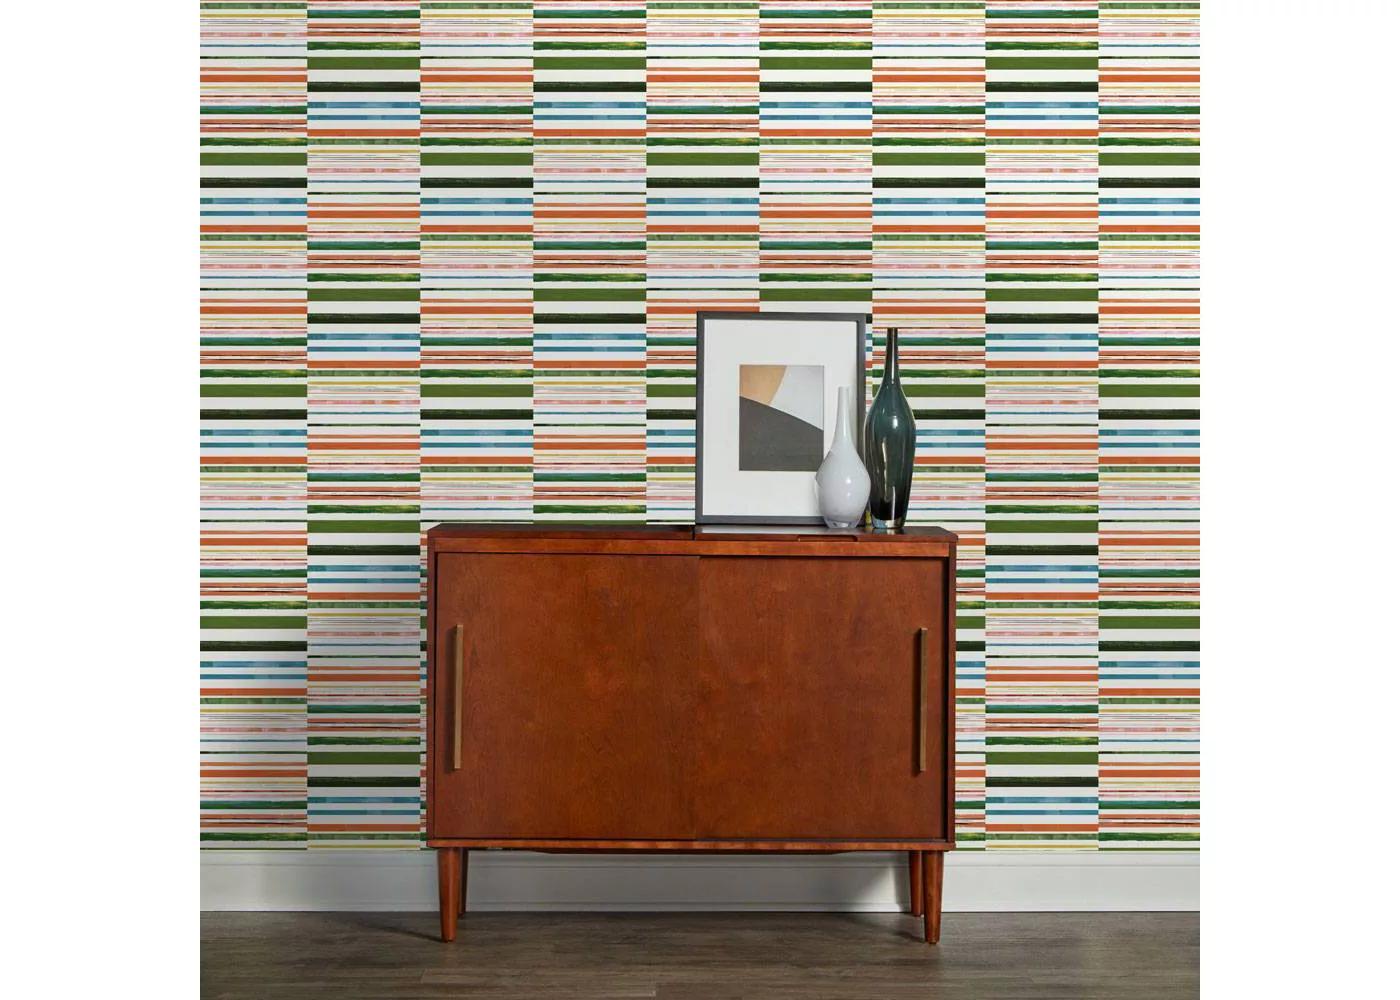 Colored Stripes Wallpaper Opalhouse Striped Wallpaper Wallpaper Self Adhesive Wallpaper